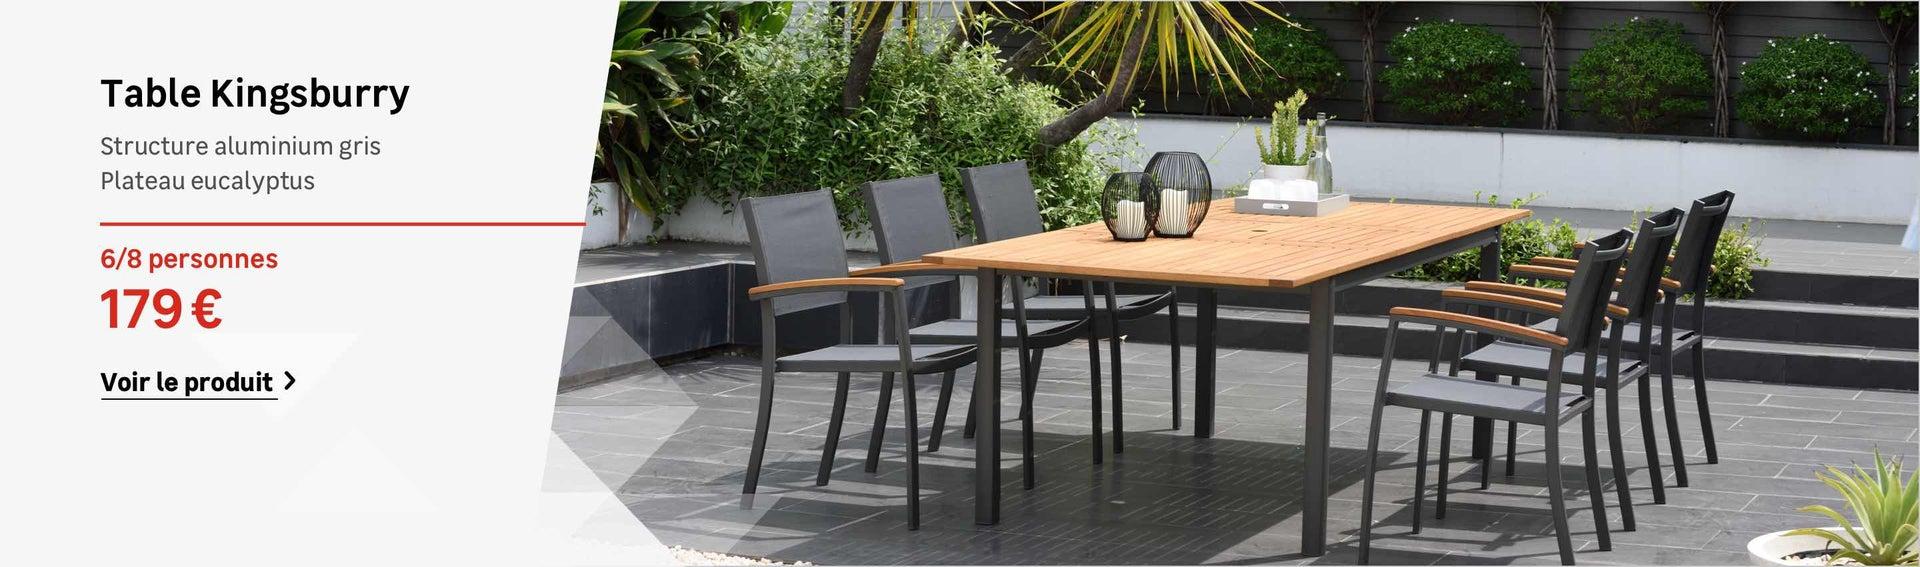 Table Et Chaise De Jardin Aluminium Inspirant Table Et ... tout Salon De Jardin Aluminium Pas Cher